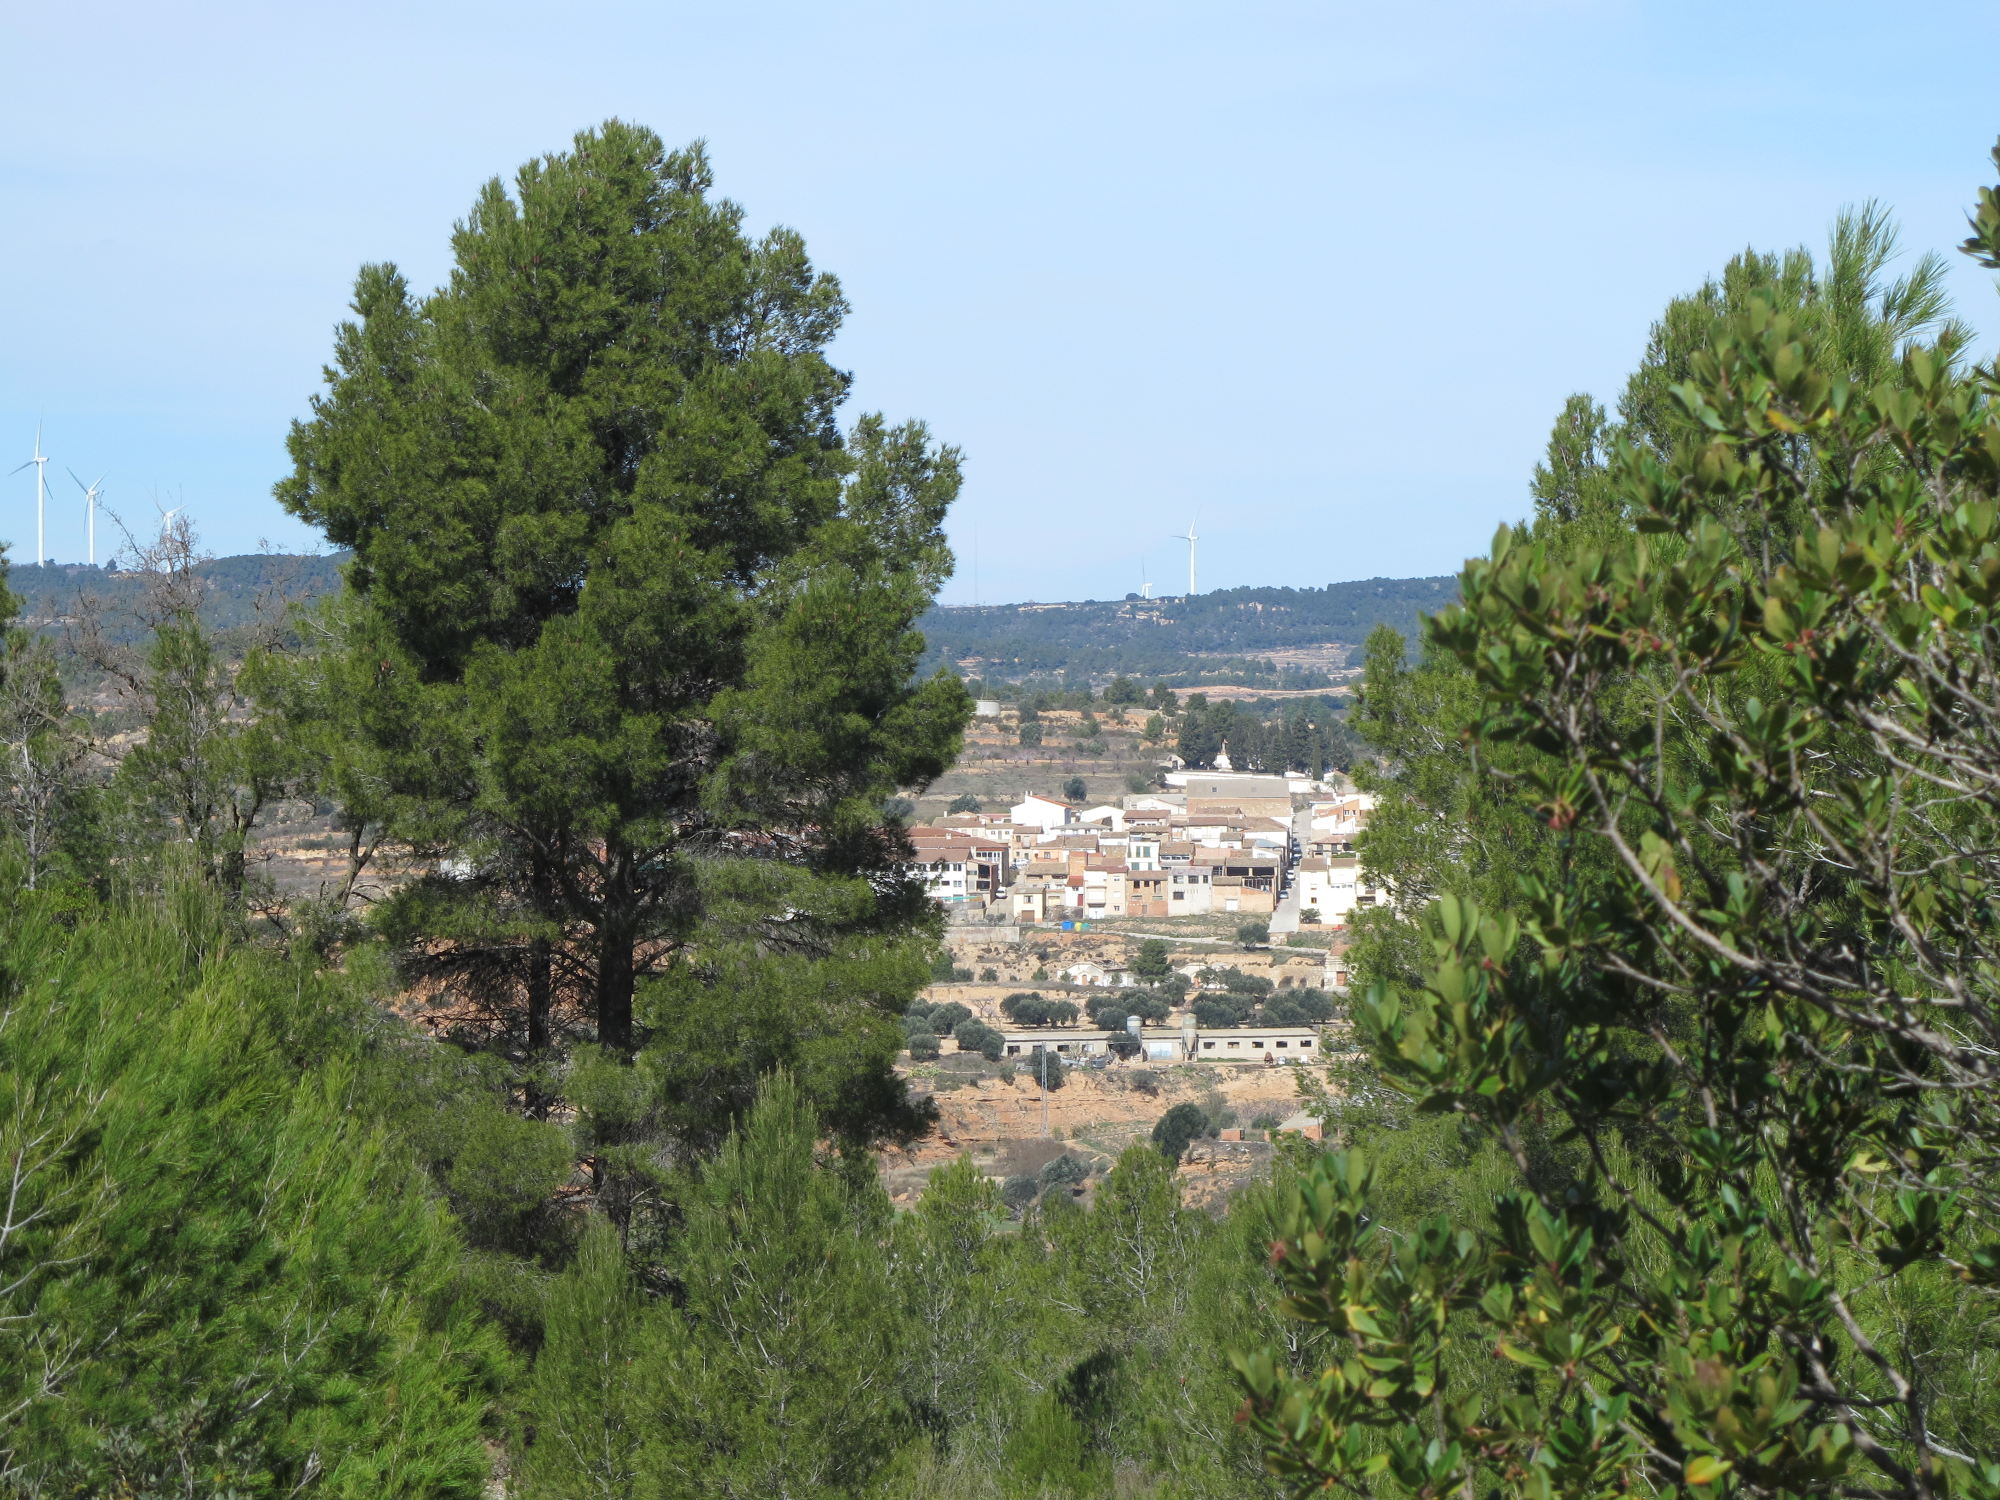 Land, For sale, Dellà el riu, Listing ID 1000, Bot, Tarragona, Spain, 43785,